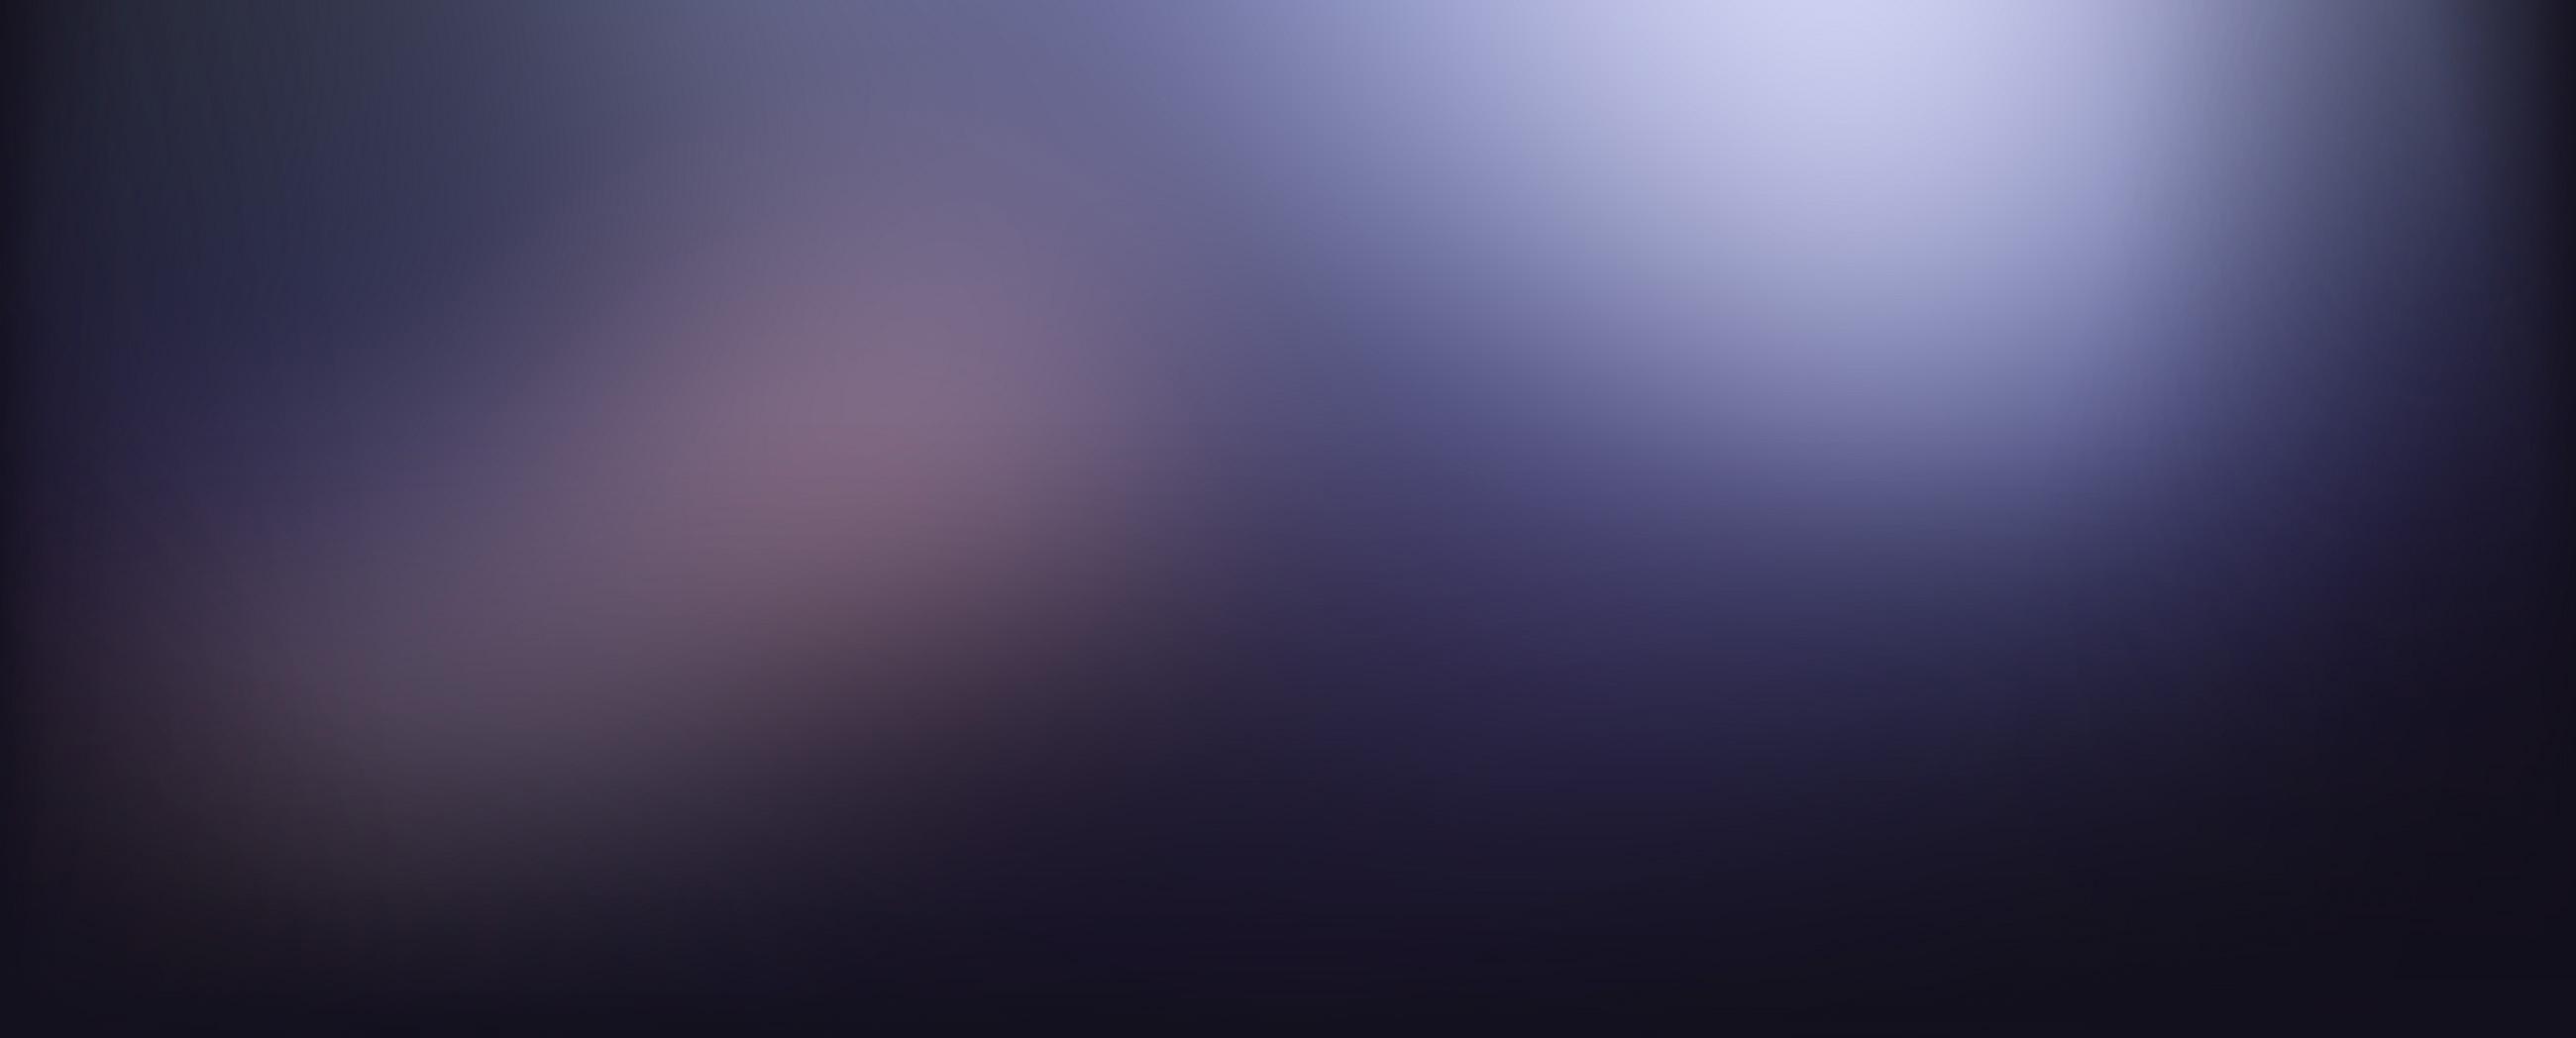 Best 55 Ae Background on HipWallpaper Fae Wallpaper Yae No 2600x1048